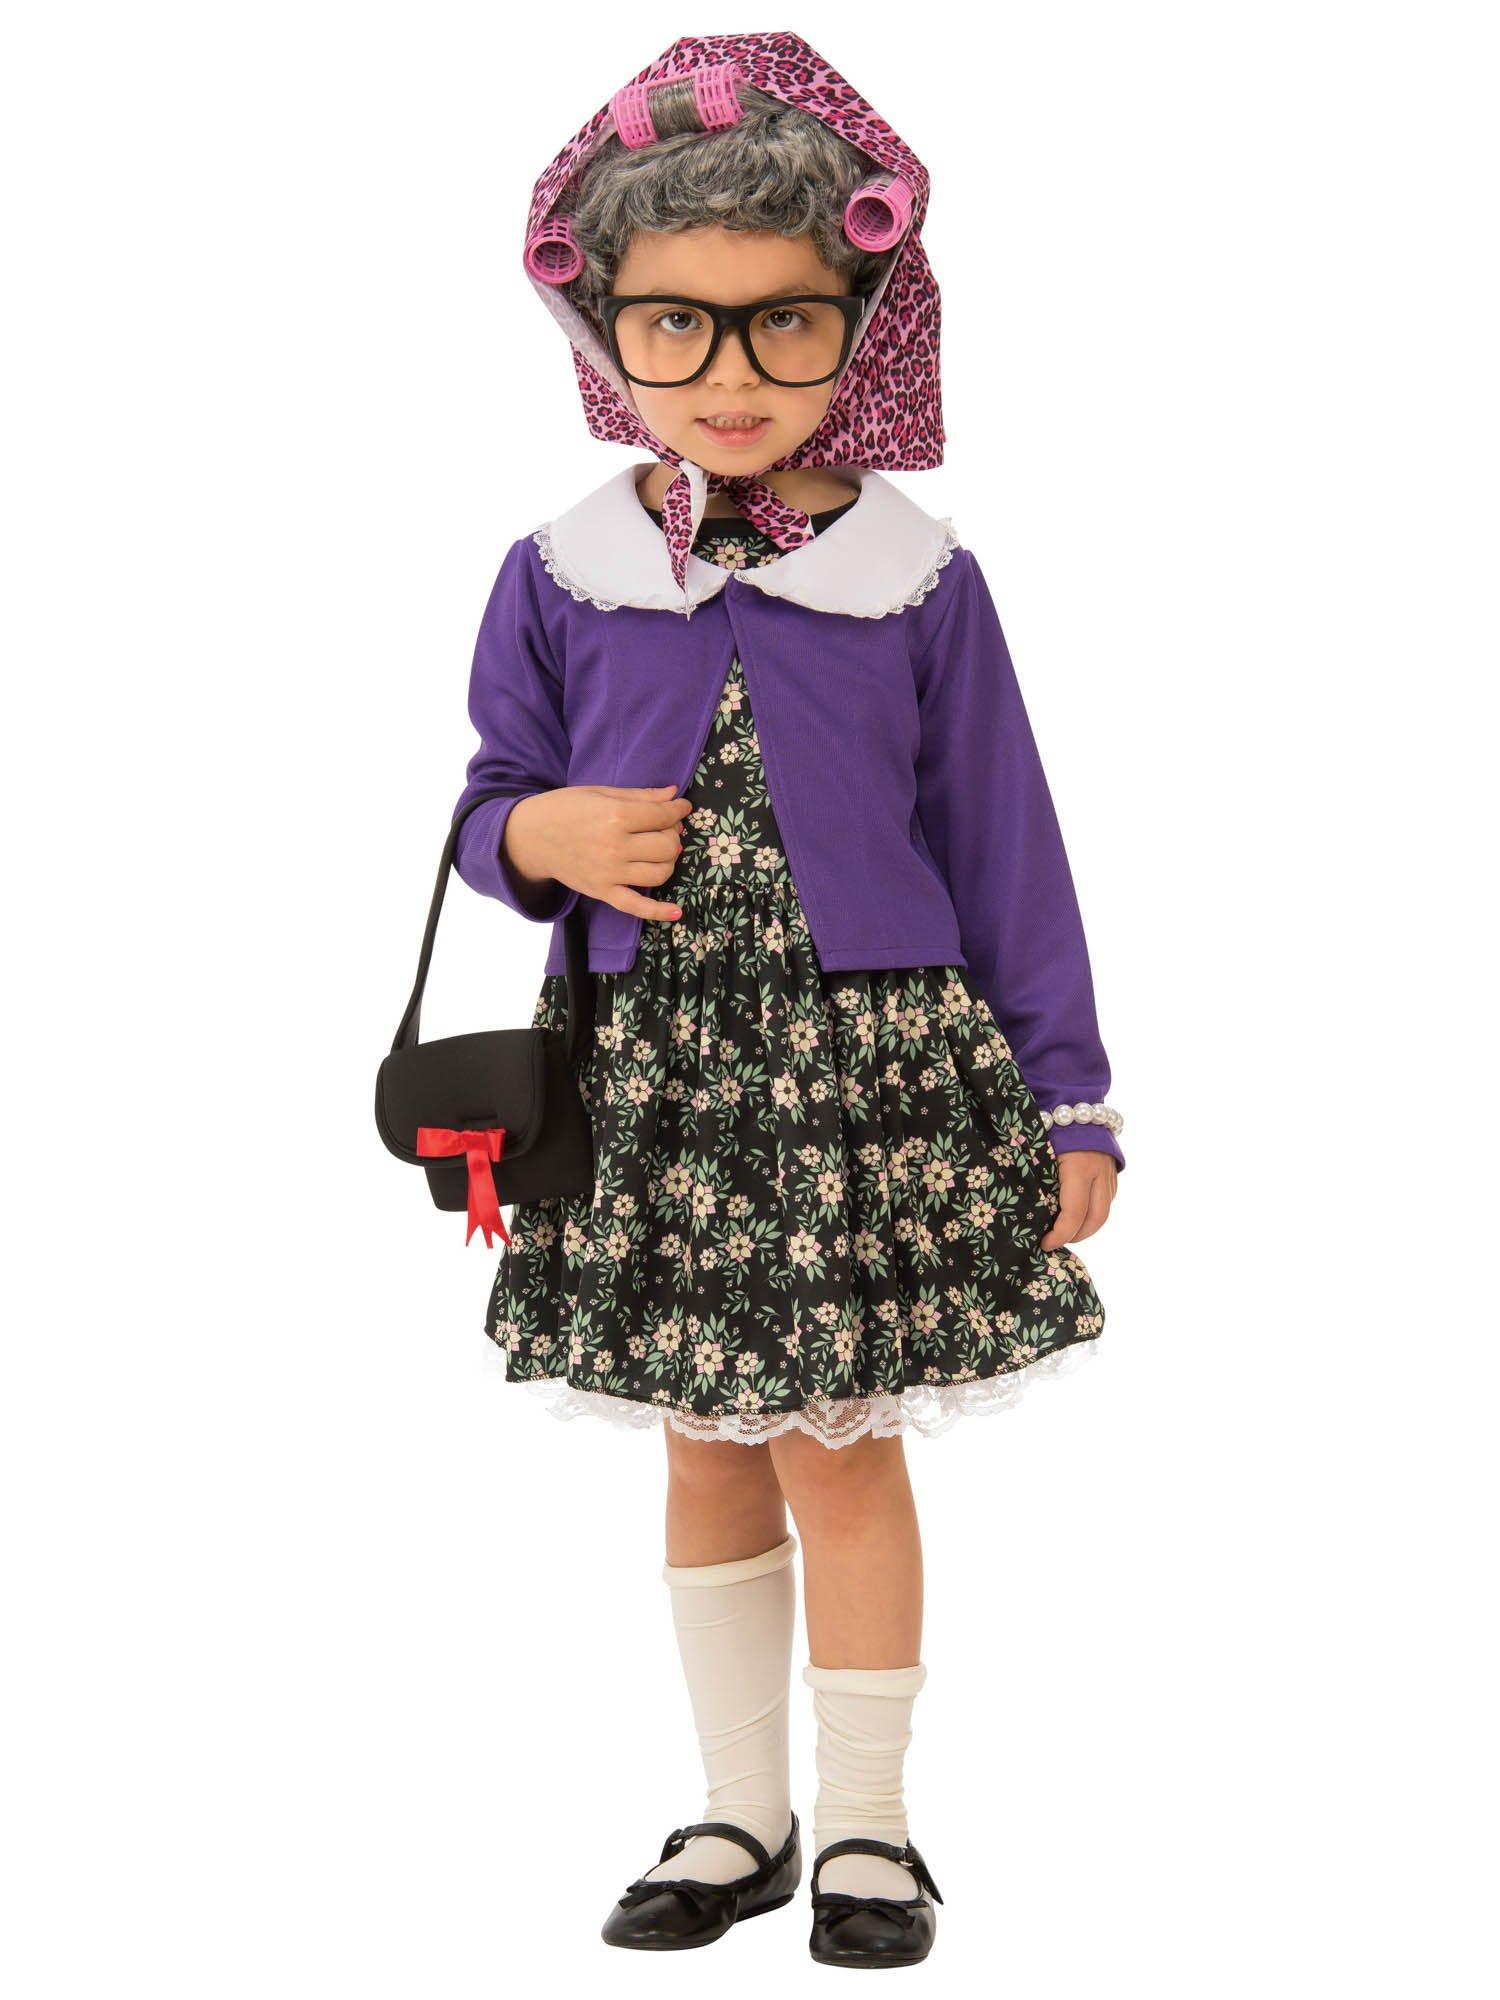 Rubie's Little Old Lady Child's Costume, Medium